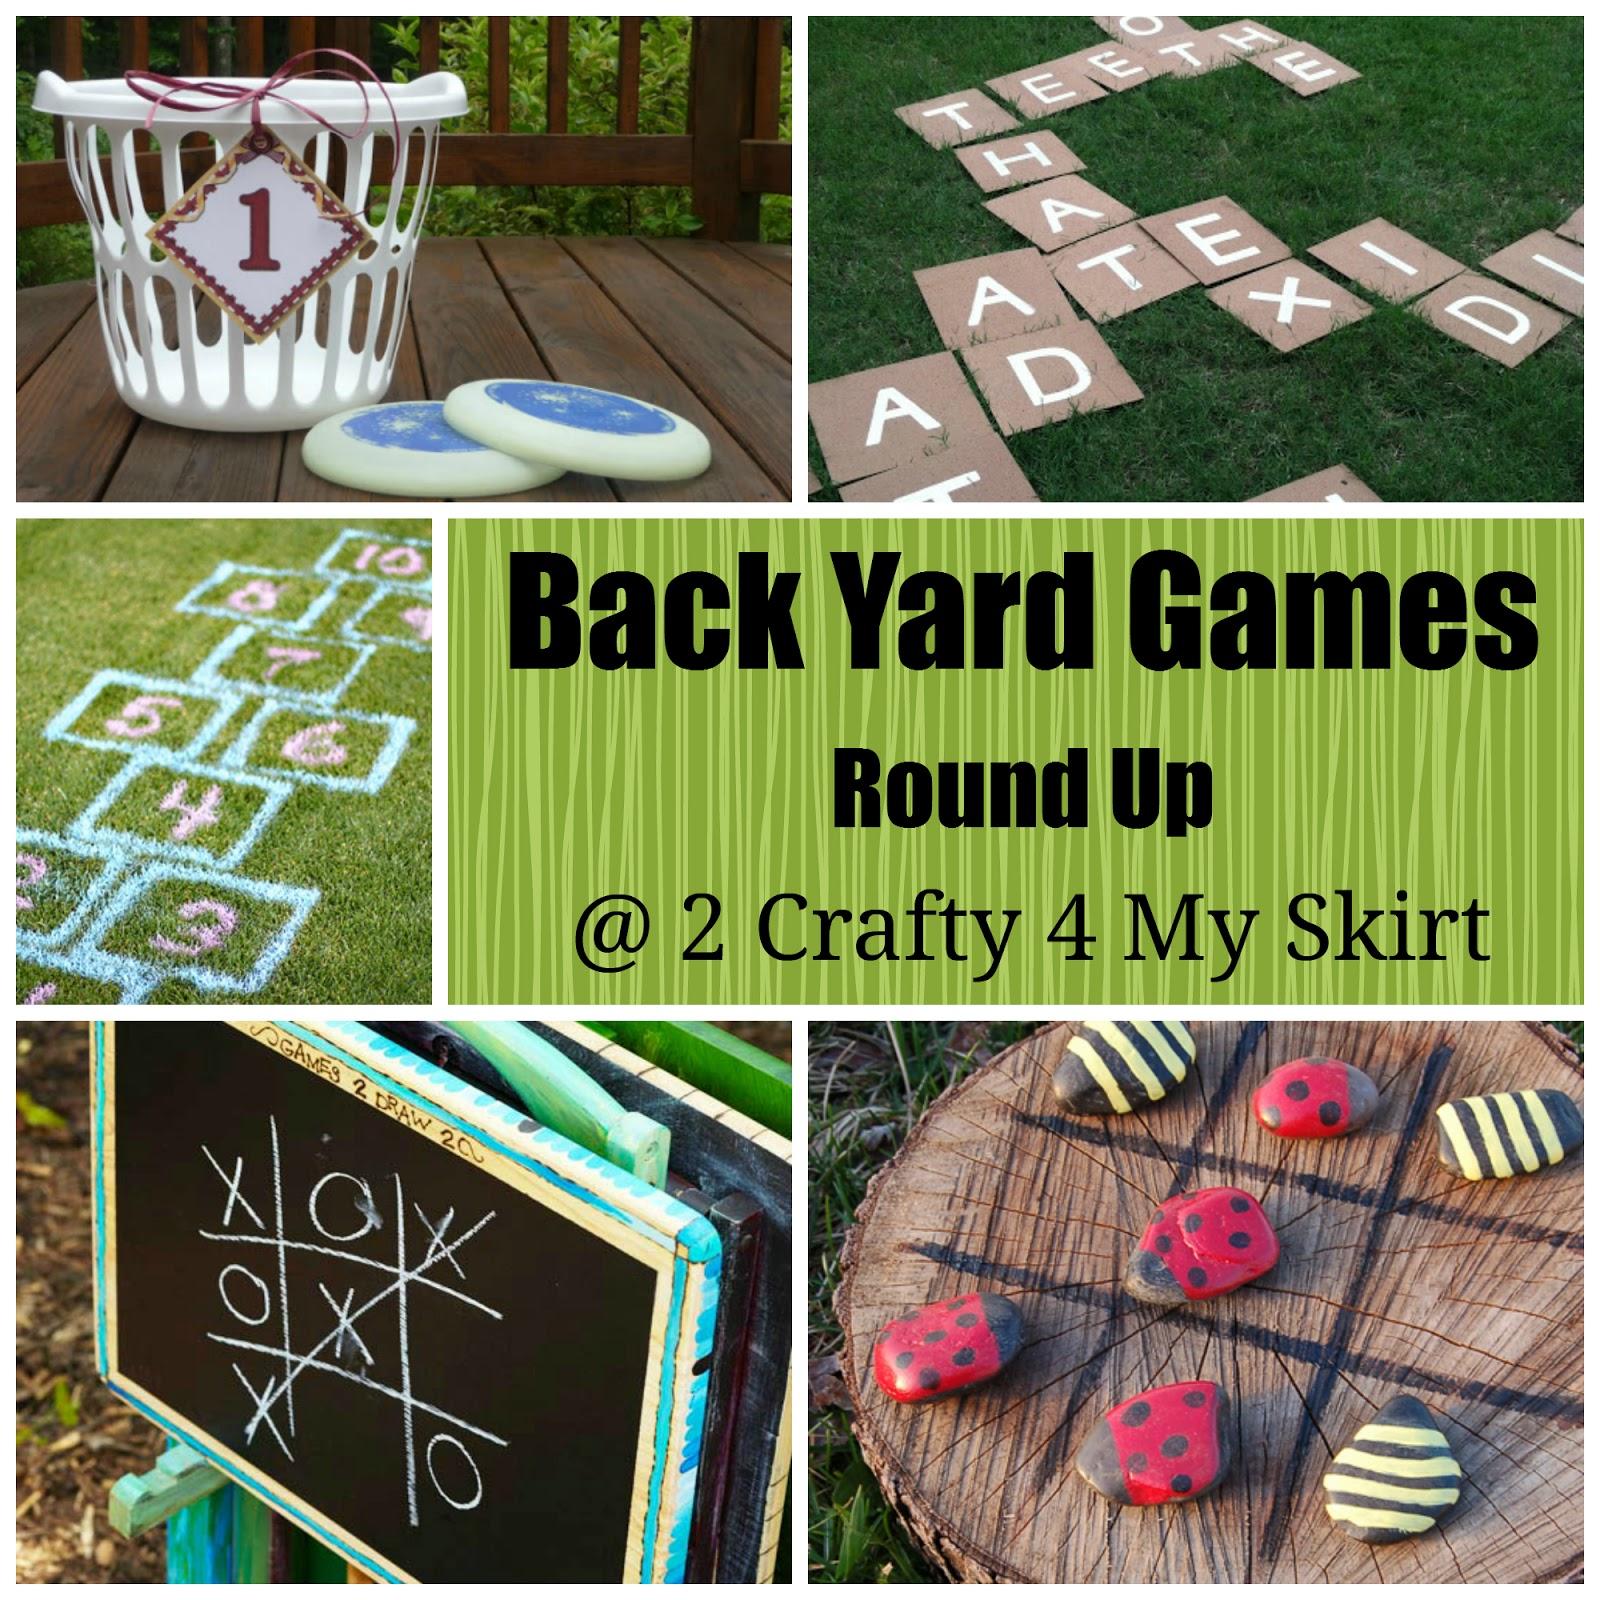 2 crafty 4 my skirt round up back yard games